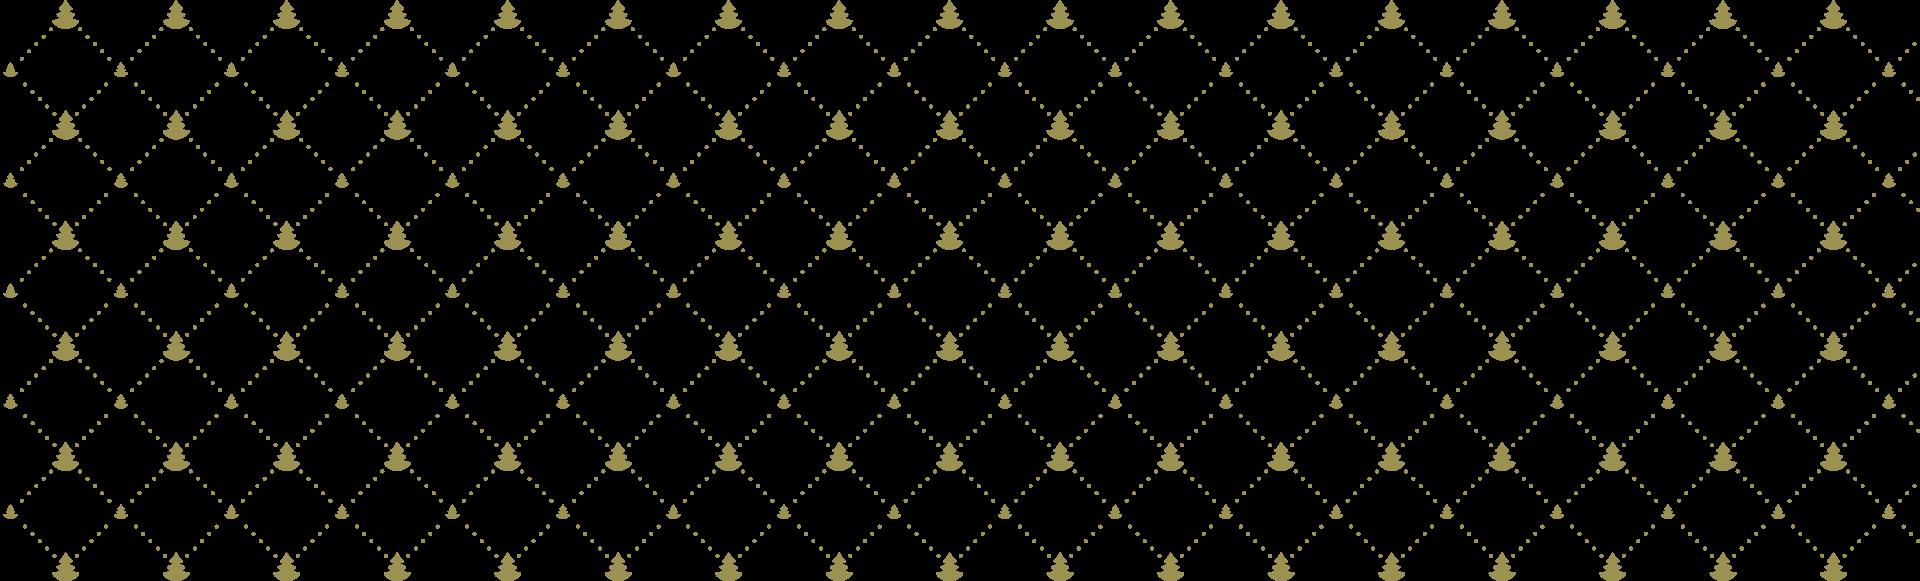 pattern-1-top